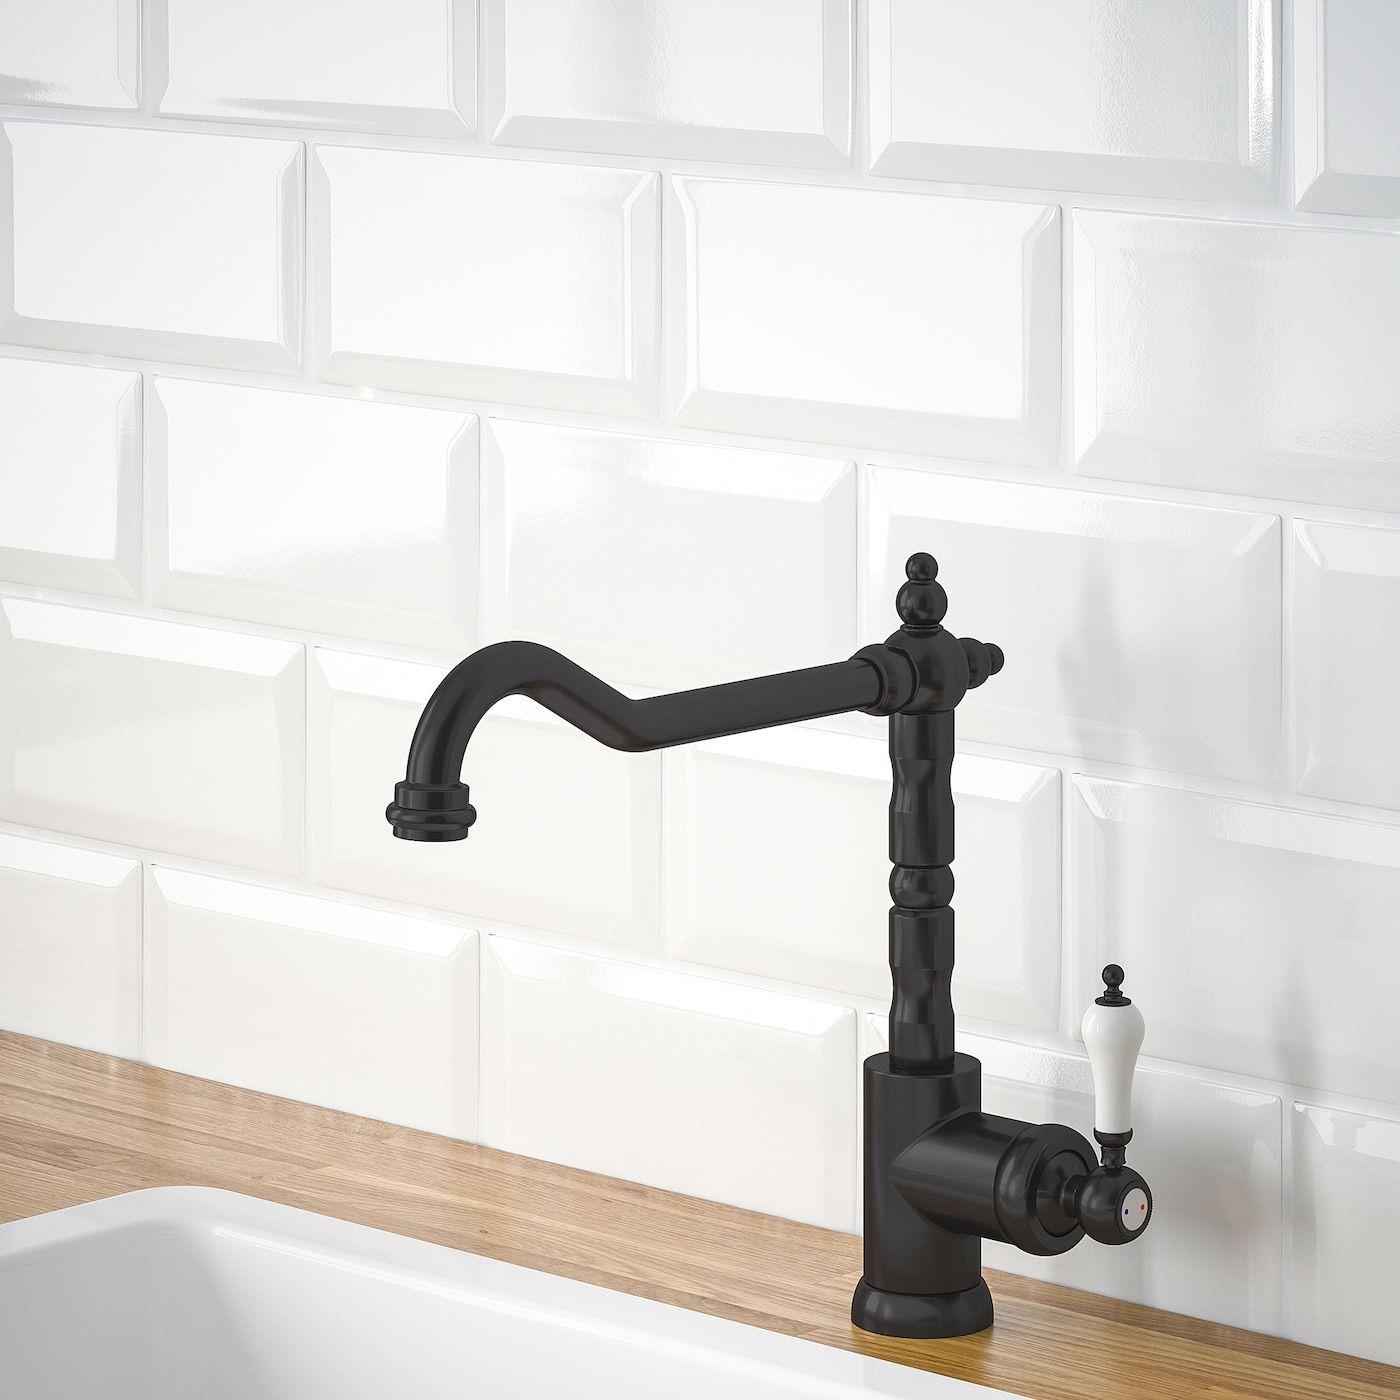 IKEA GLITTRAN Kitchen faucet black in